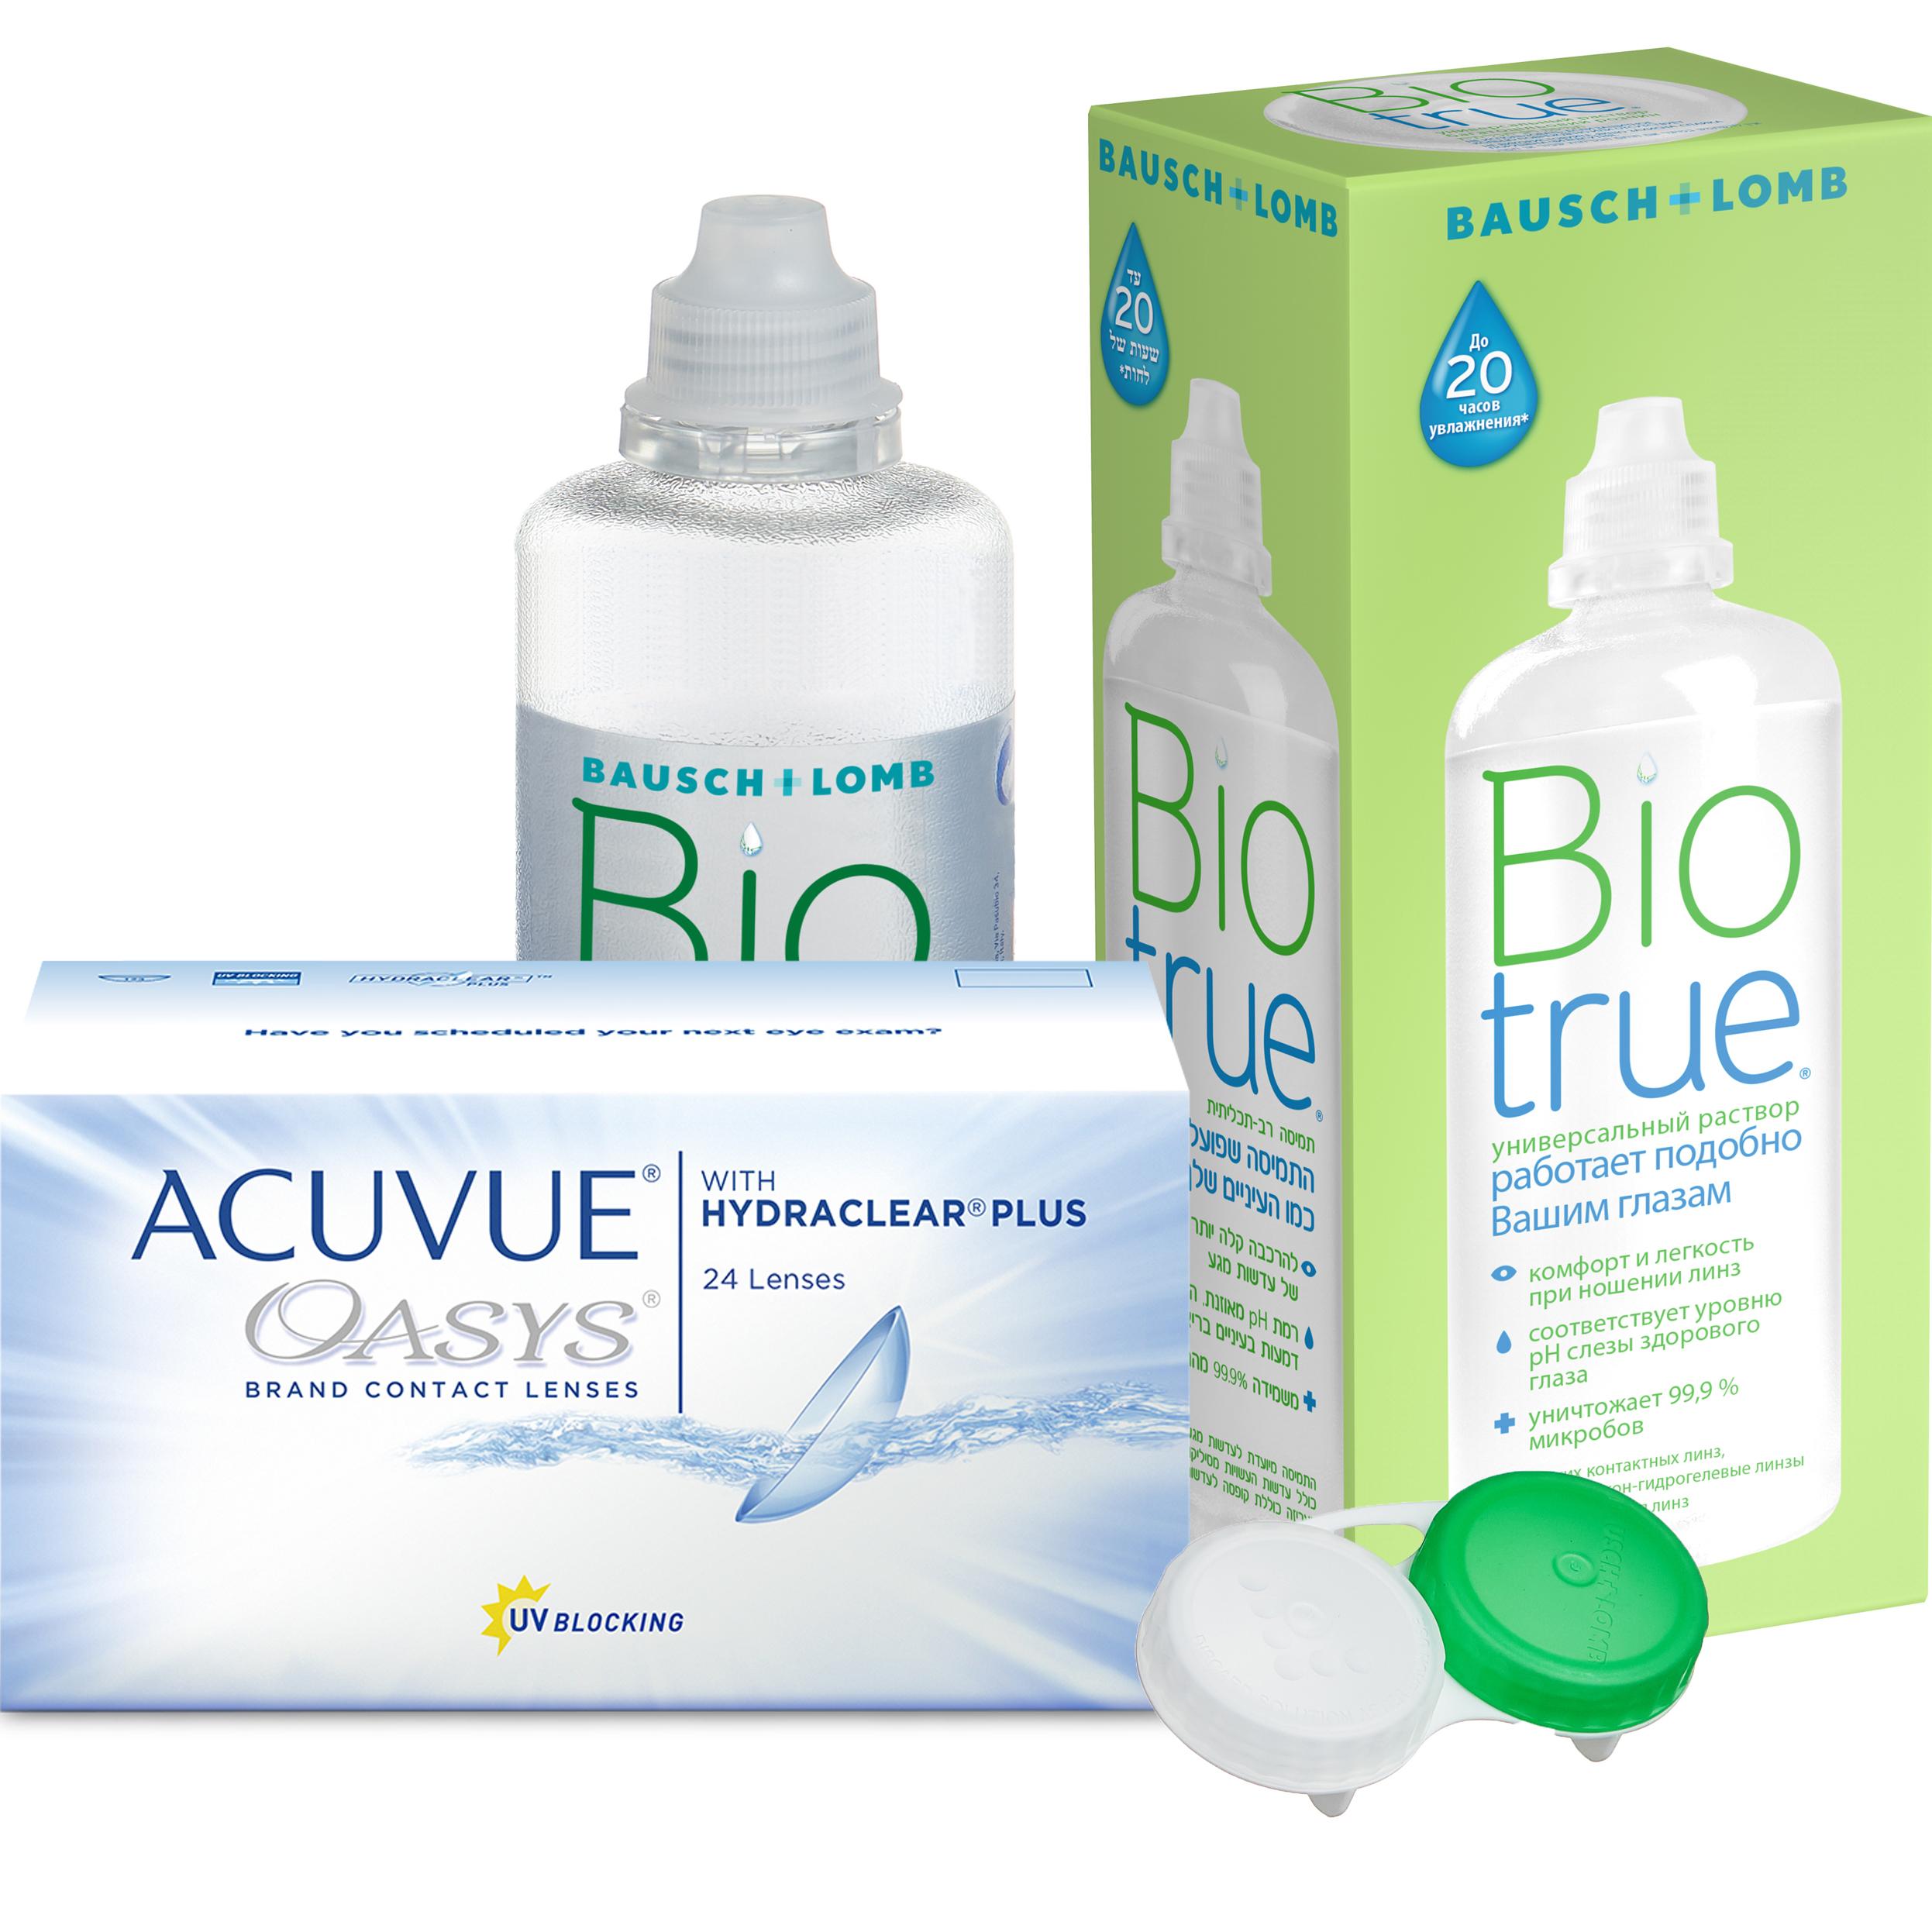 Купить Oasys with Hydraclear Plus 24 линзы + Biotrue, Контактные линзы Acuvue Oasys with Hydraclear Plus 24 линзы R 8.8 +5, 75 + Biotrue 300 мл